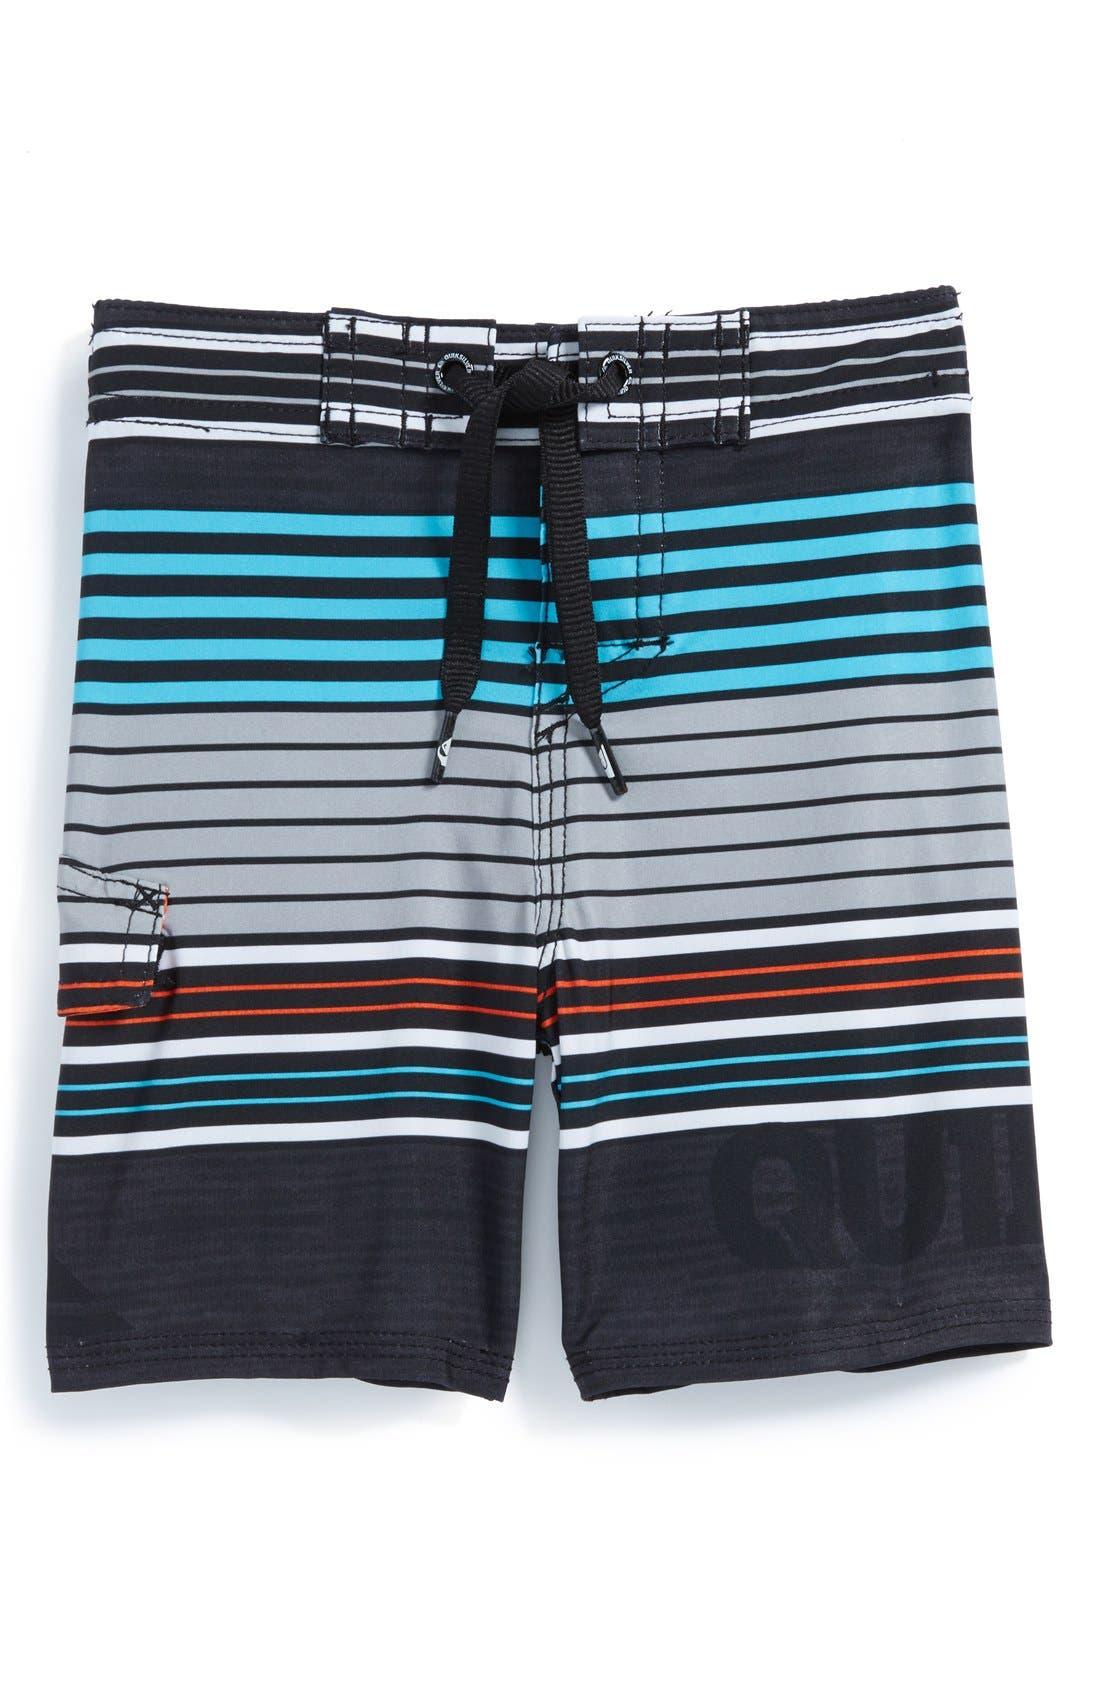 Main Image - Quiksilver 'Cerrano' Board Shorts (Baby Boys)